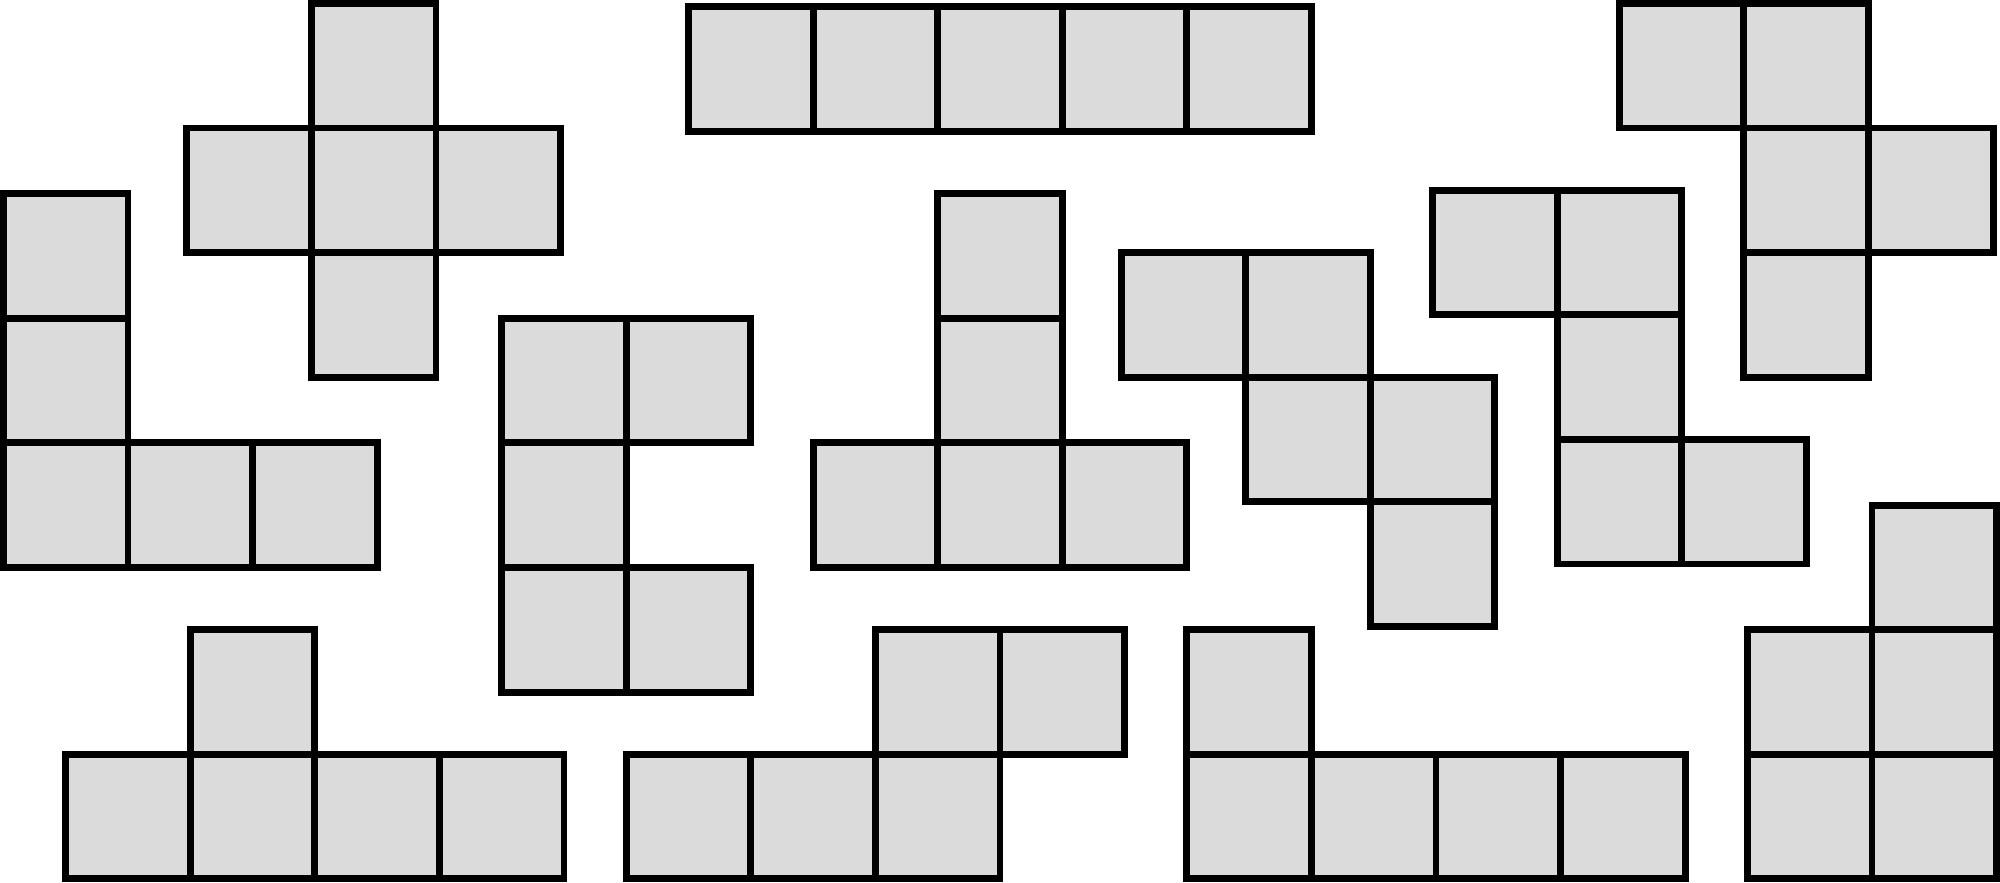 graphic regarding Pentominoes Printable identified as Pentominoes (a.k.a Polyominoes)\